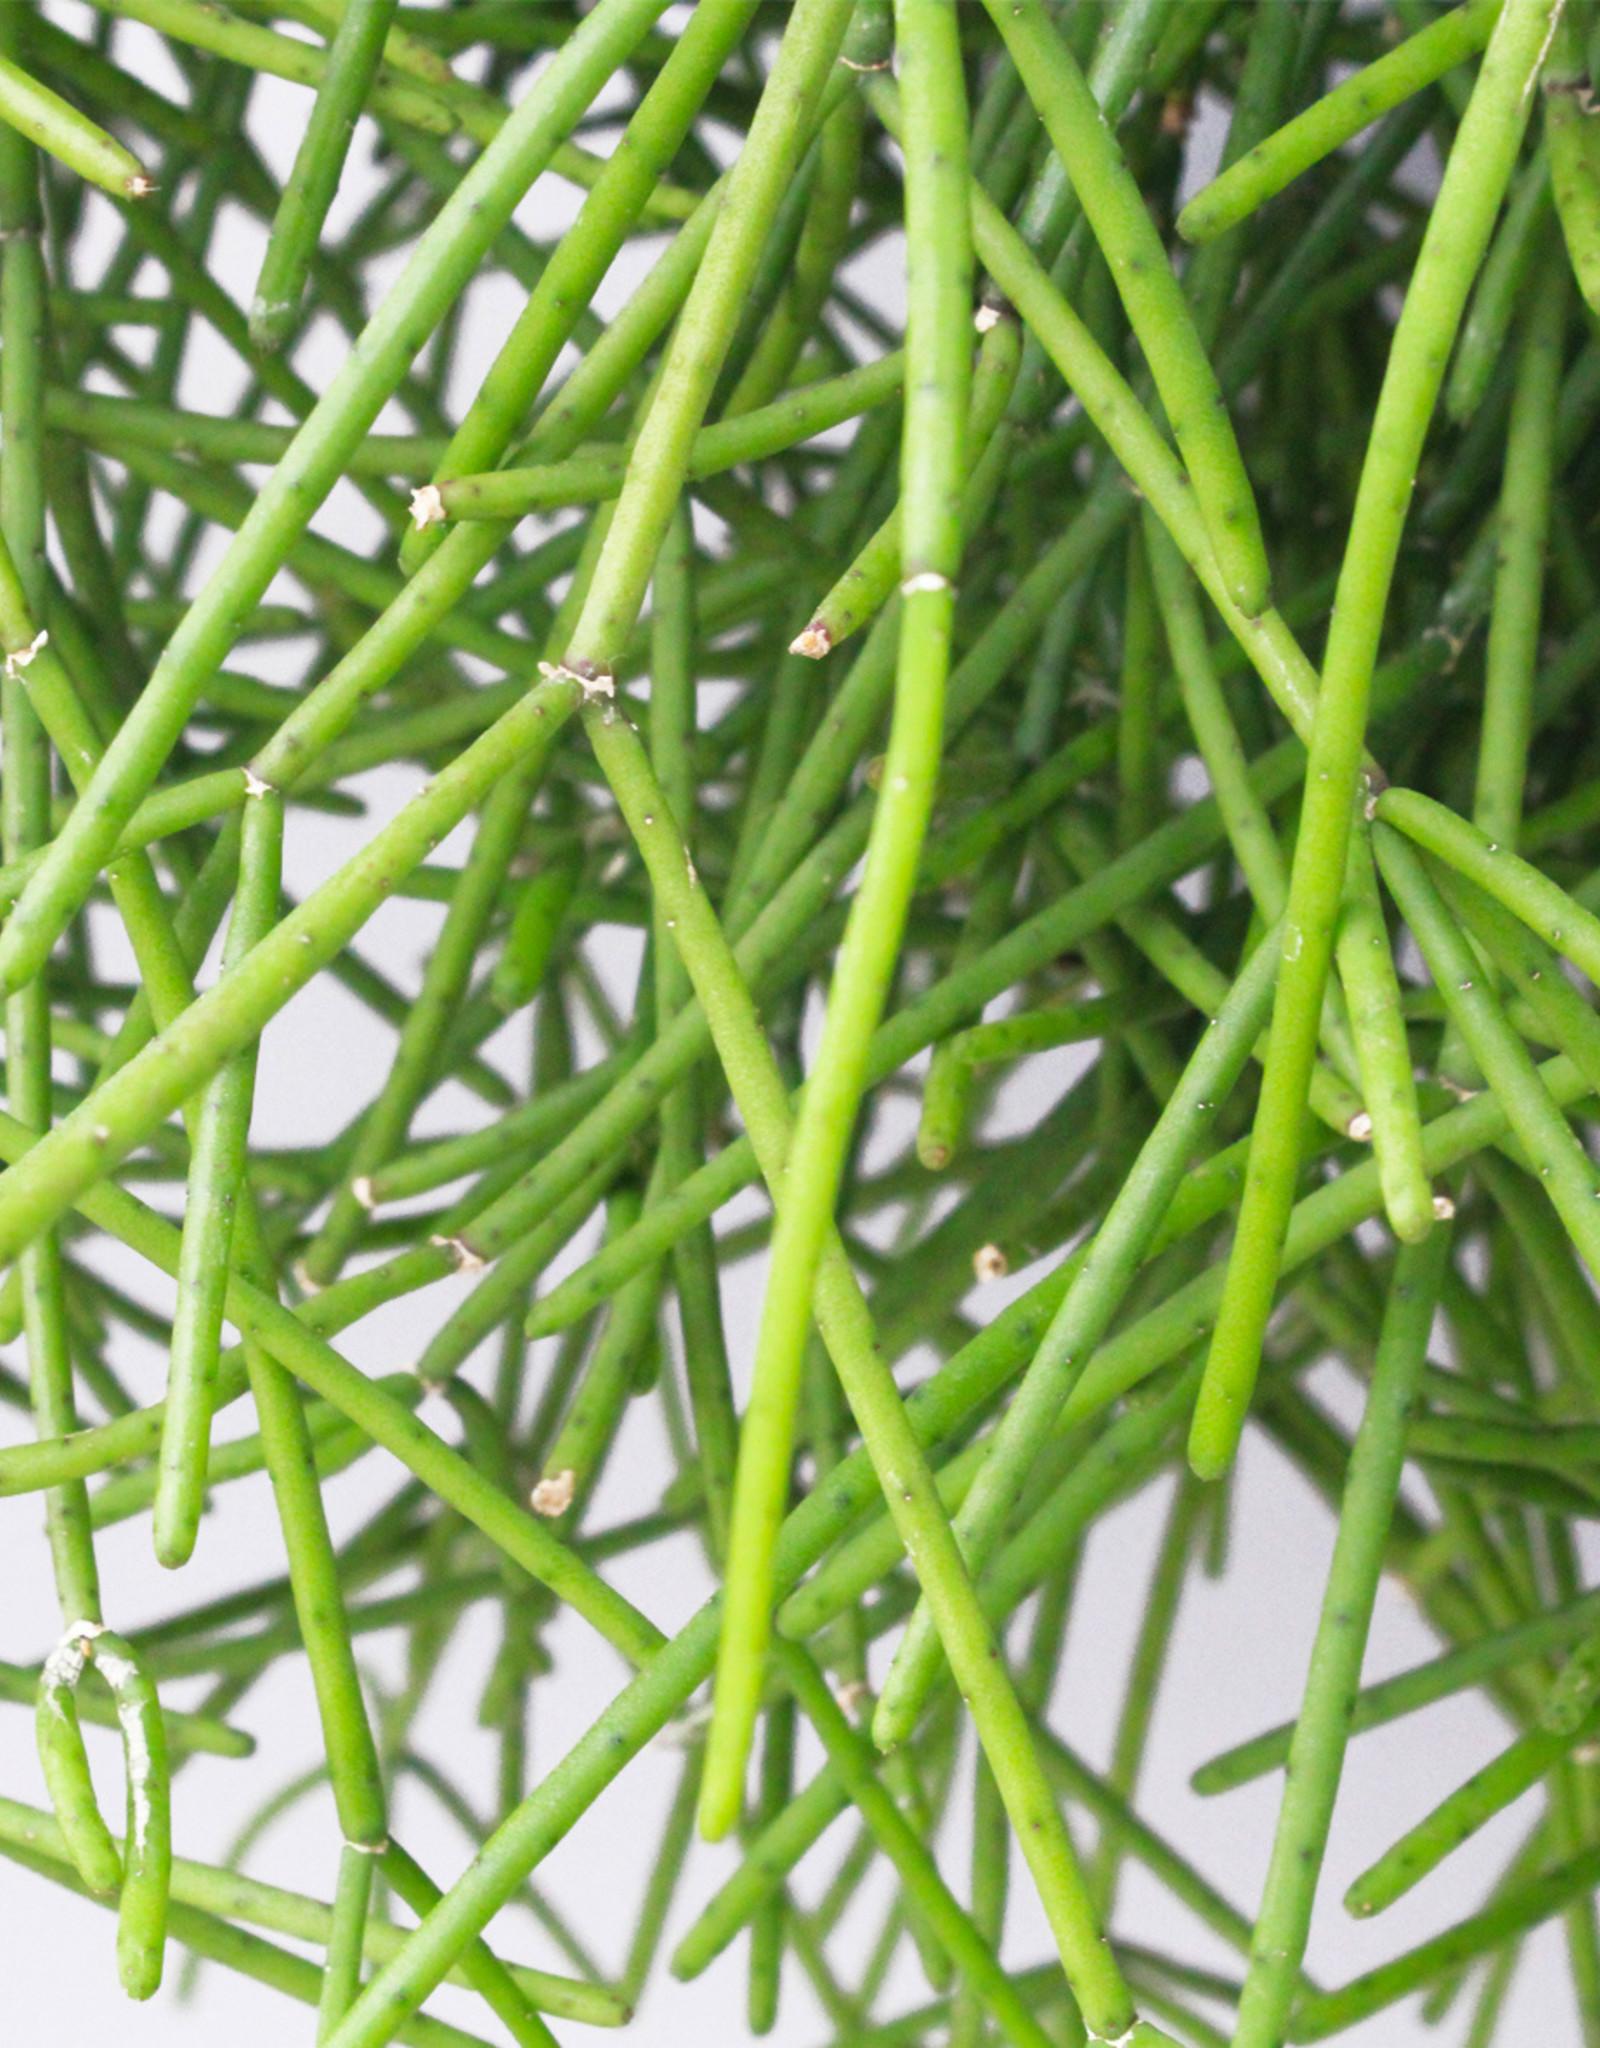 Rhipsalis neves amondii - Koraalcactus